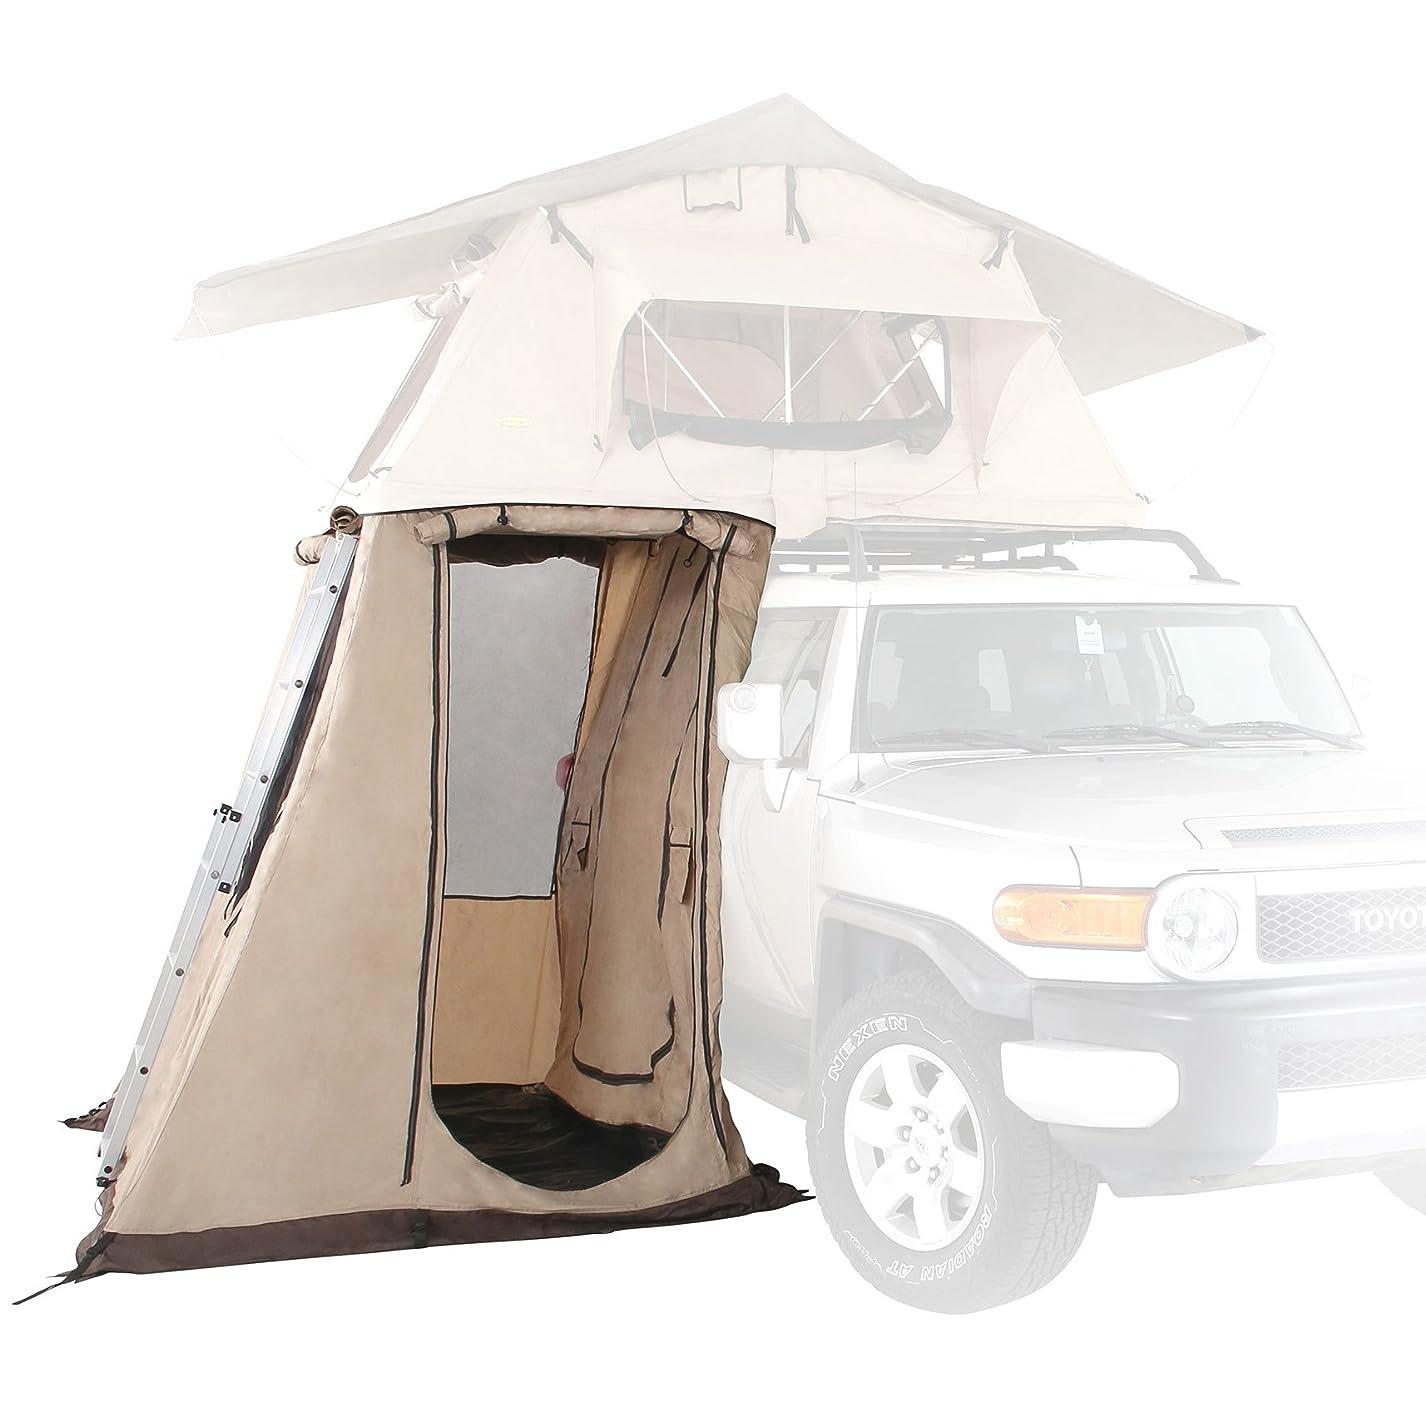 Smittybilt 2788 Standard Size Tent Annex faq019293506212